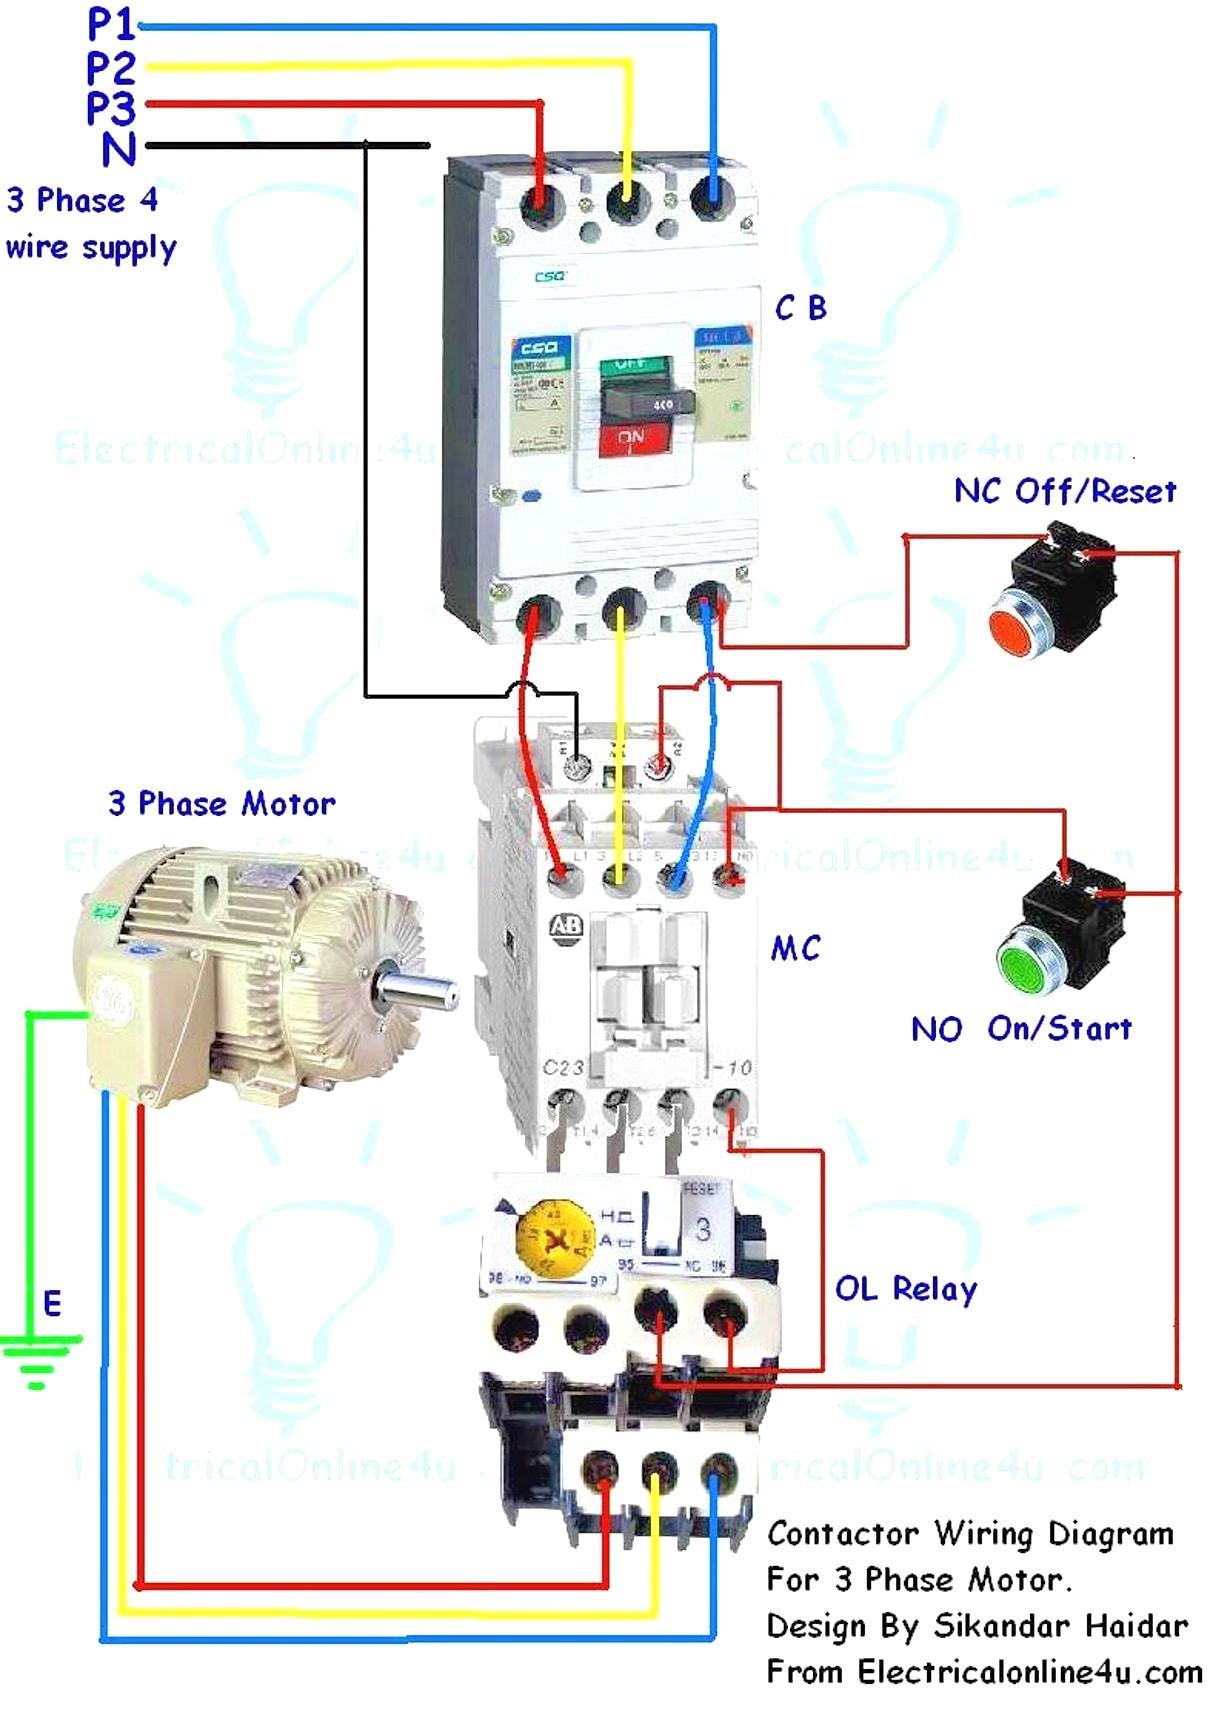 hw_3960] contactor relay wiring diagram on 3 phase reversing ... 3 pole contactor wiring diagram contactor wiring diagram a1 a2 abole xeira mohammedshrine librar wiring 101